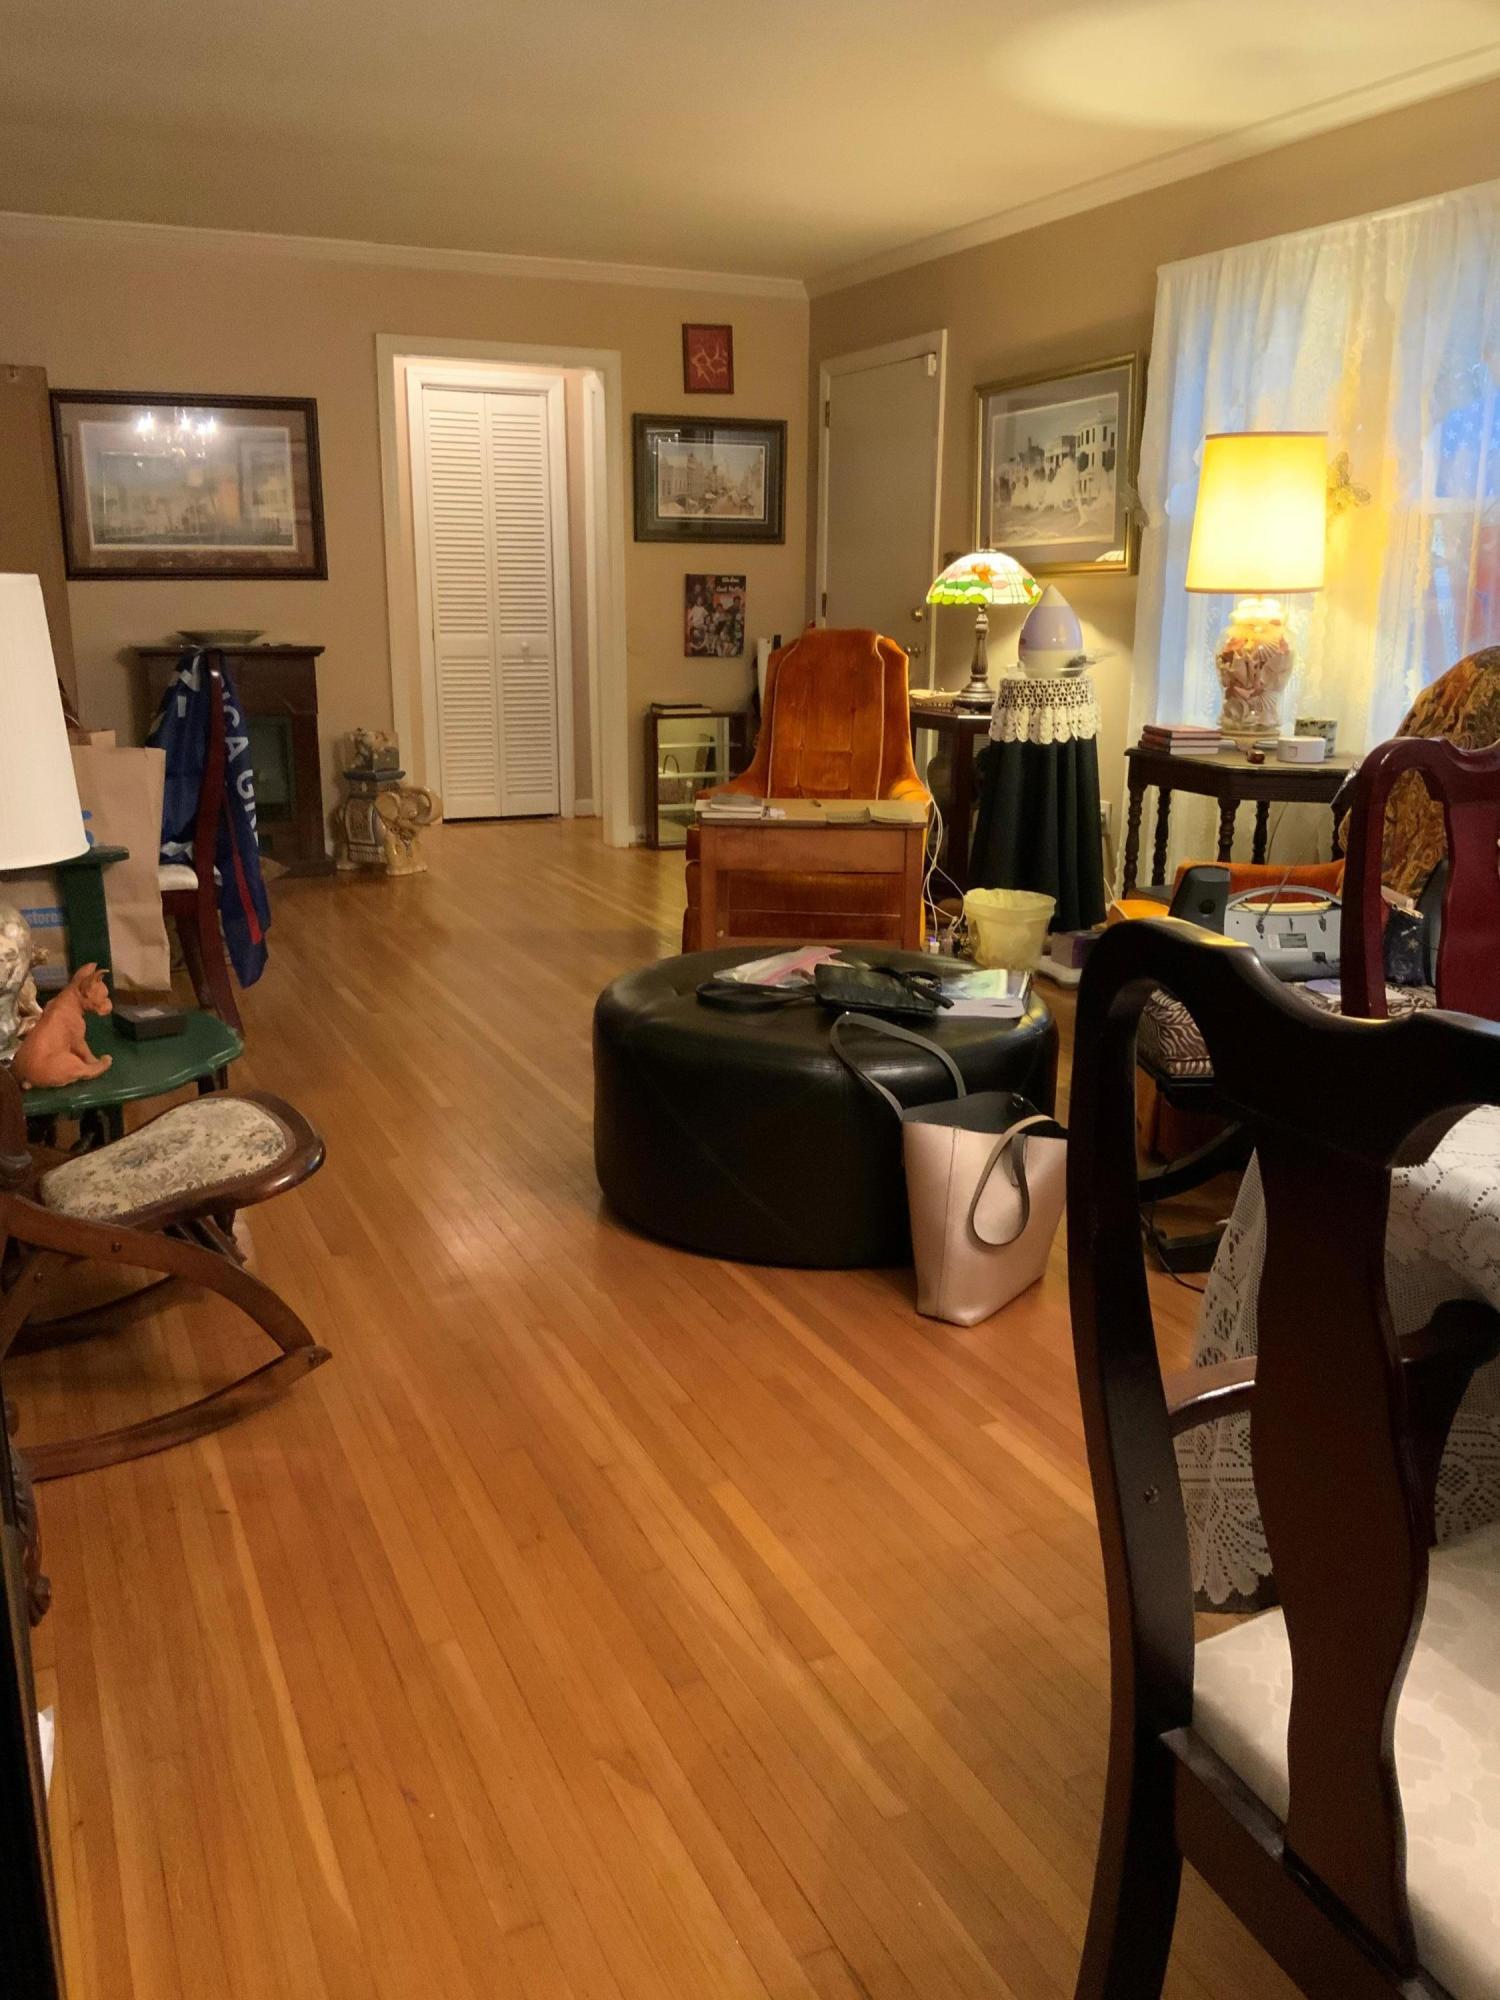 Northbridge Terrace Homes For Sale - 1156 Northbridge, Charleston, SC - 8